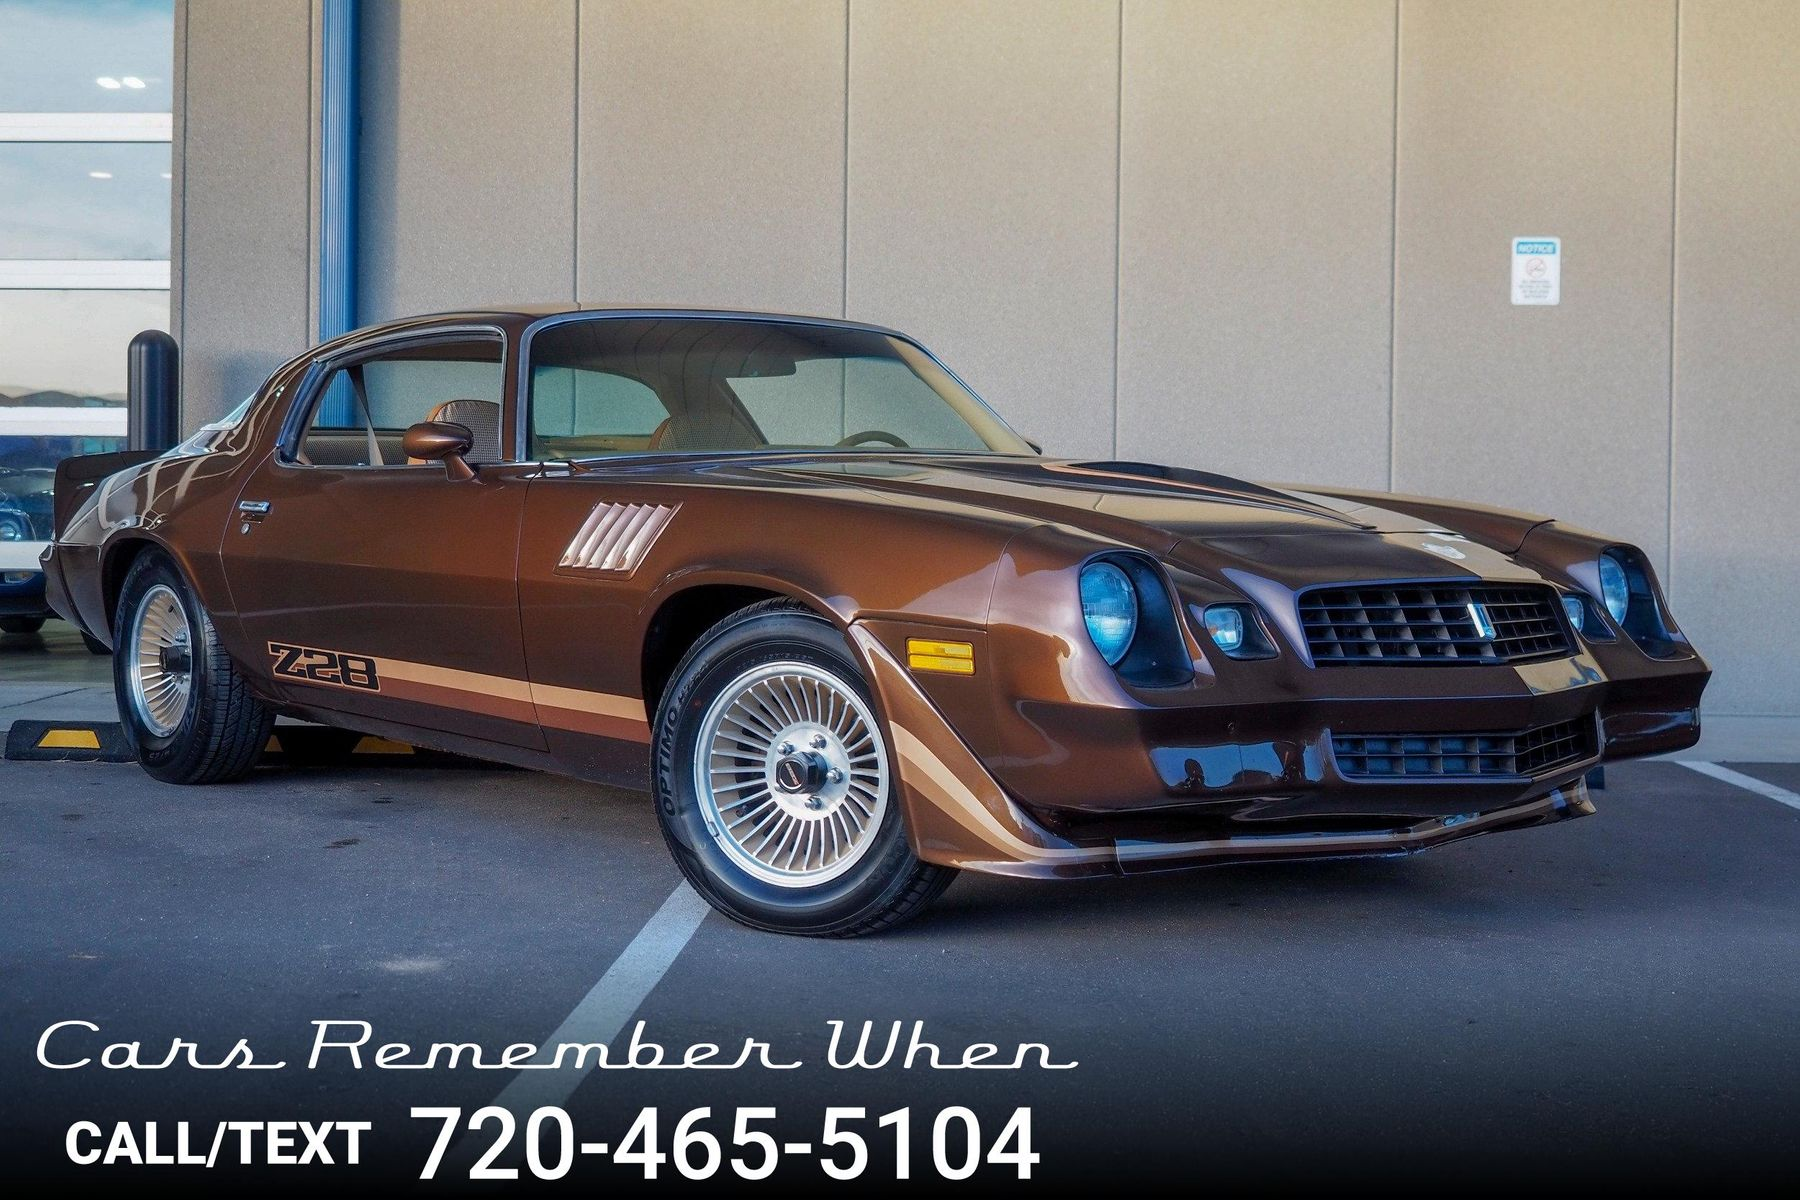 1979 Chevrolet Camaro Z28 350 V8 4 Speed R134a AC For Sale